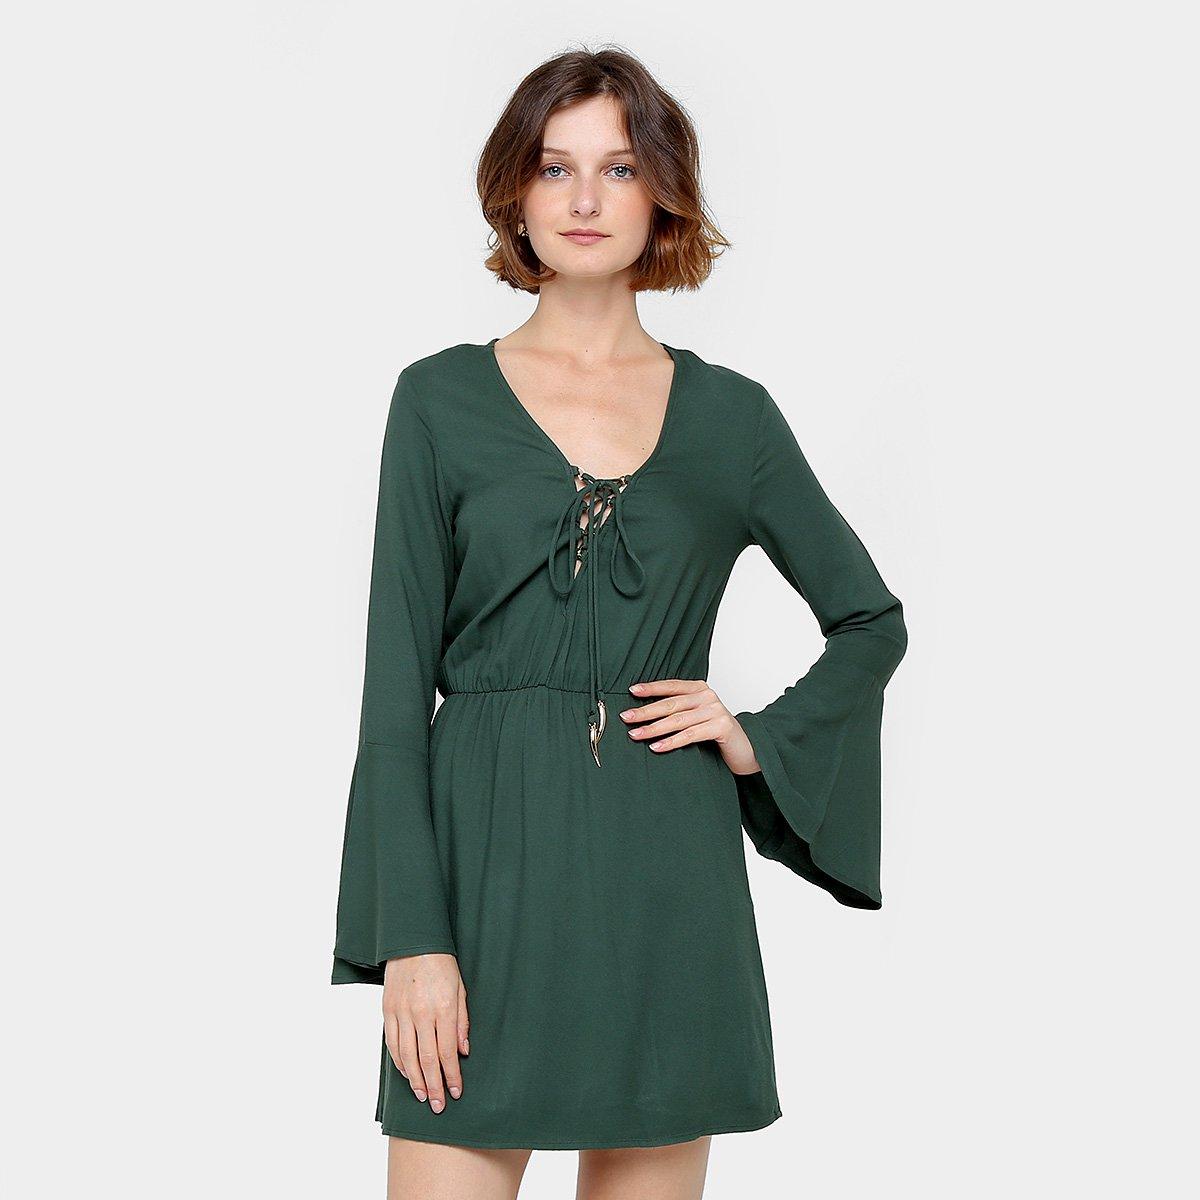 Vestido verde militar manga longa